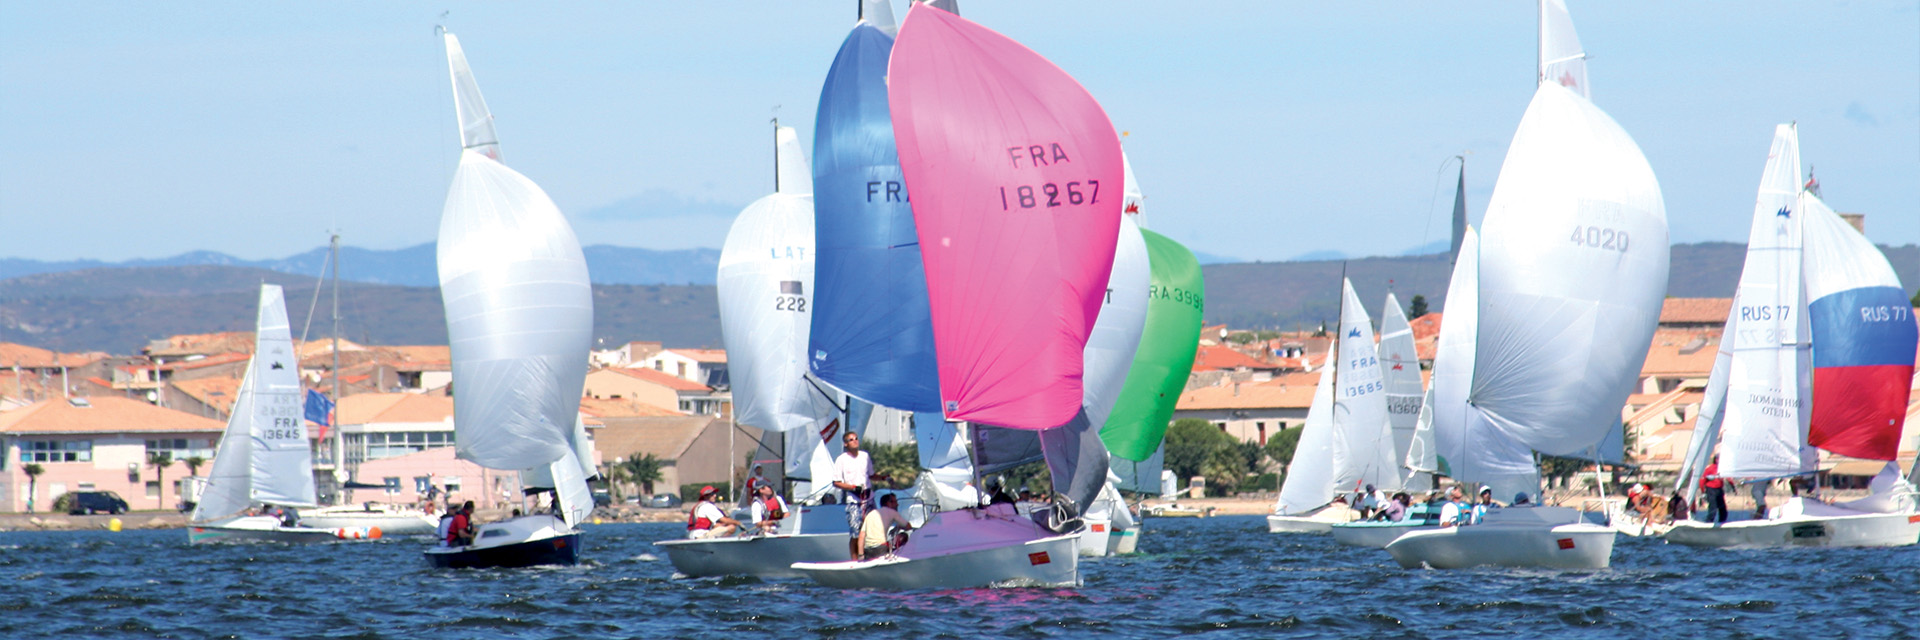 Village_club_vacances_mediterranee-sud-est-village-club-thalasse-canot-bateau